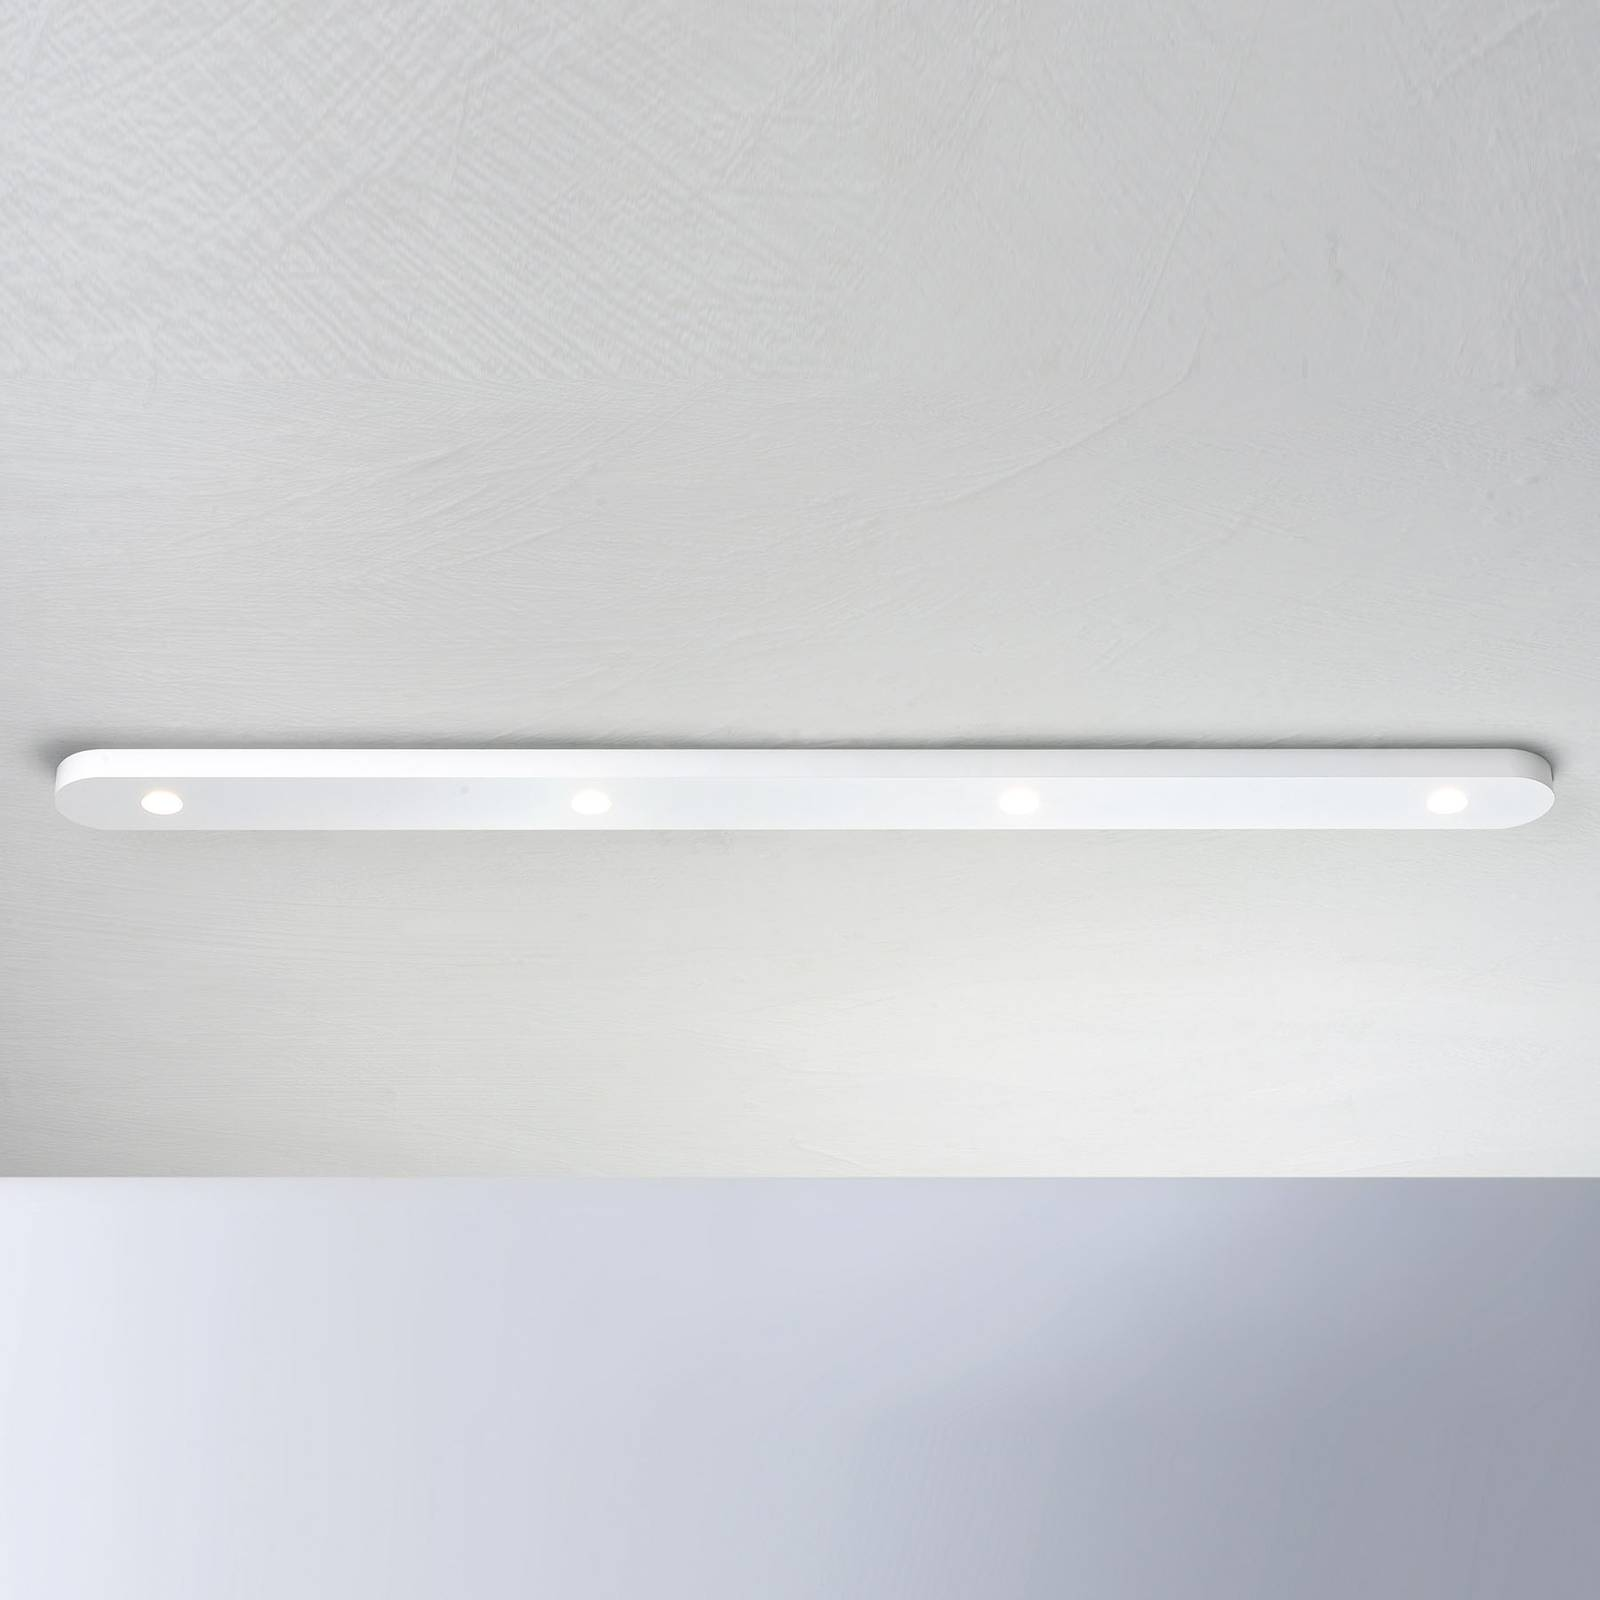 Bopp Close LED plafondlamp 4-lamps, wit